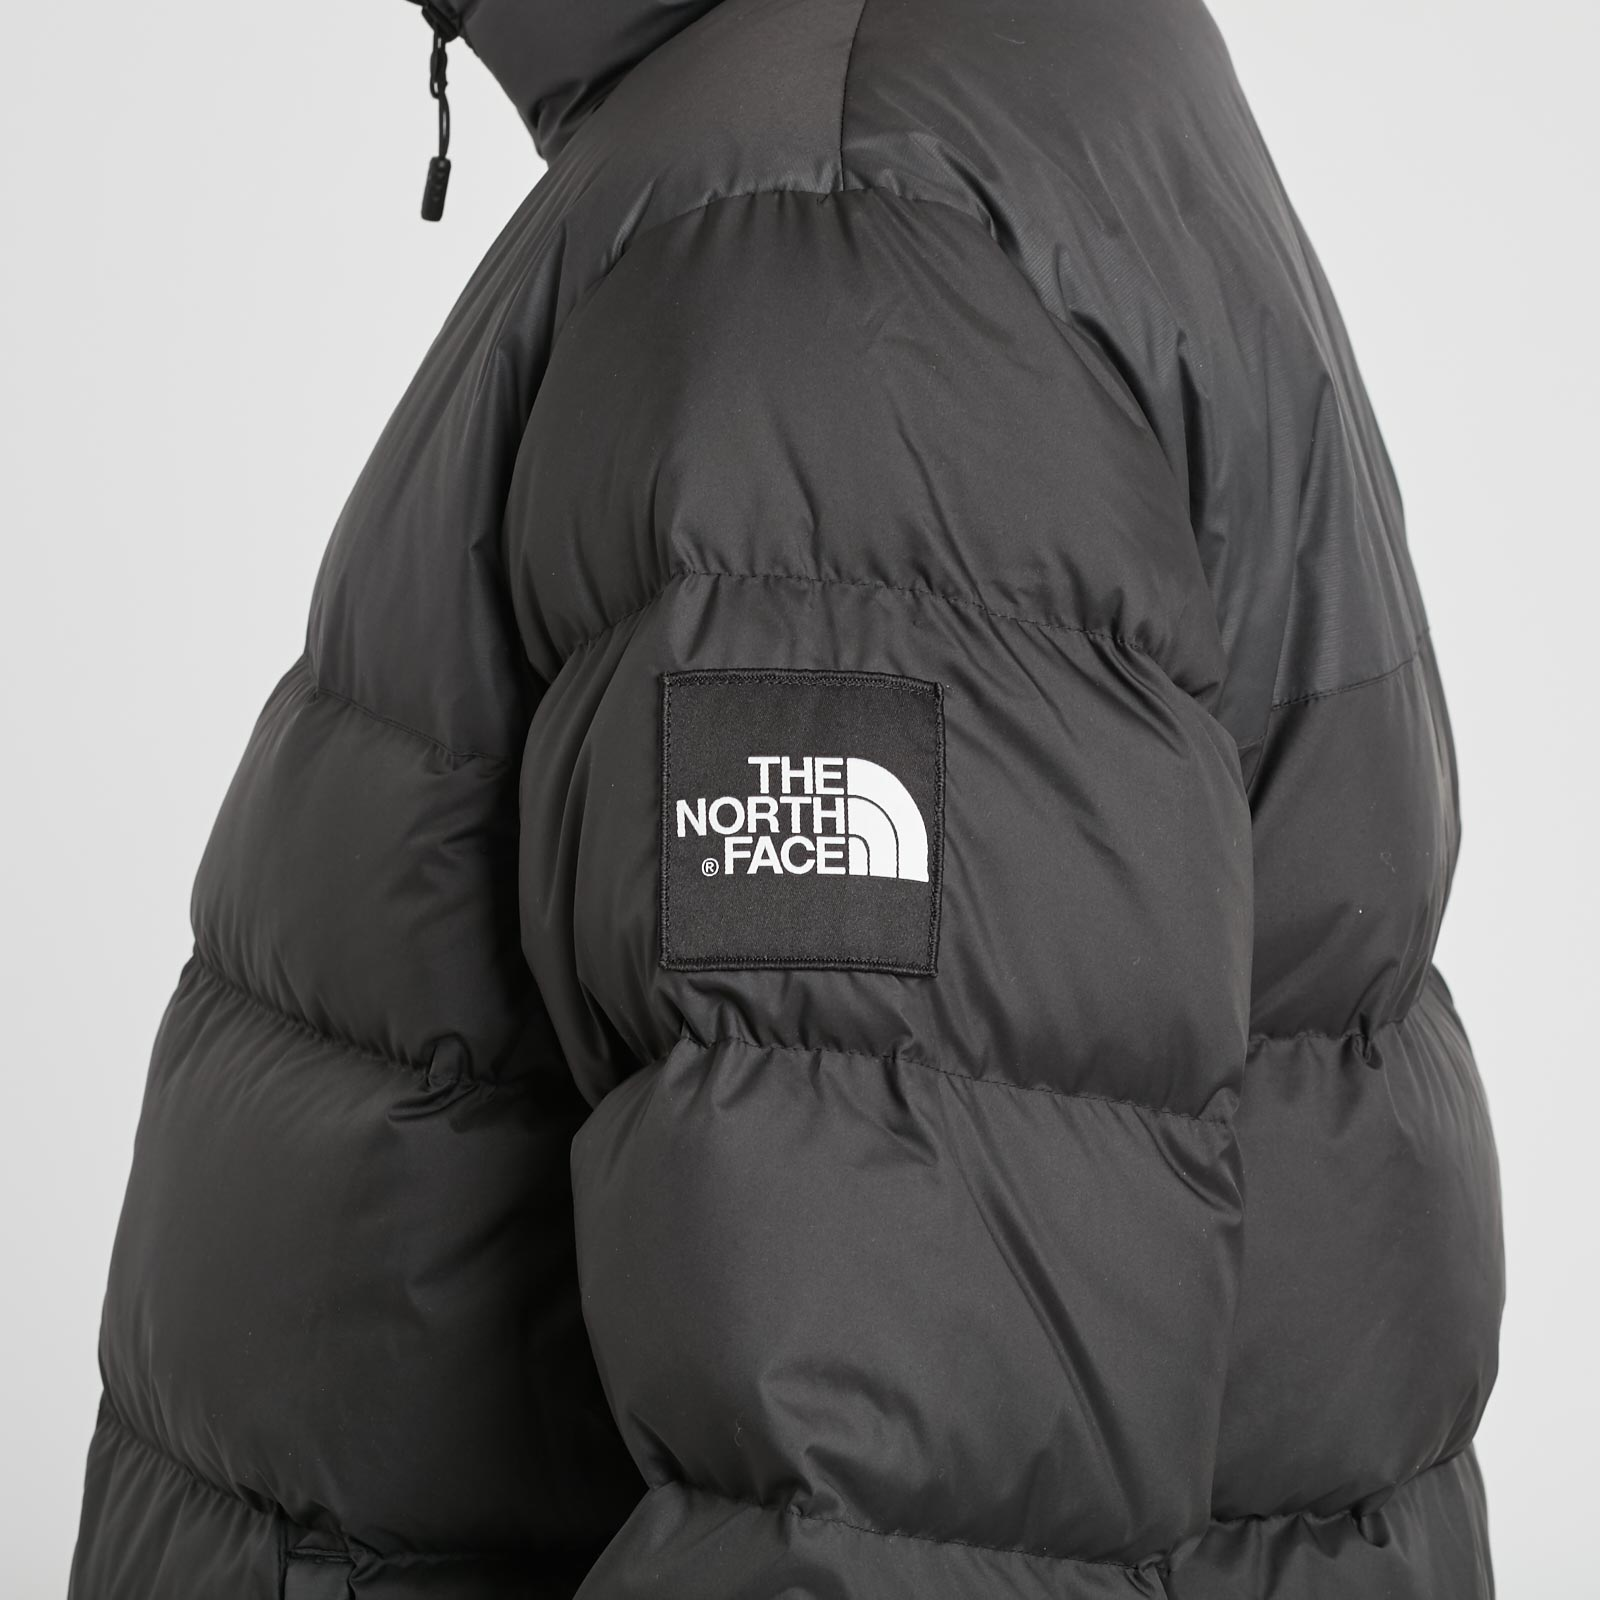 The North Face M 1992 Nuptse Jacket - T92zwejk3 - Sneakersnstuff ... 15ea80f1d